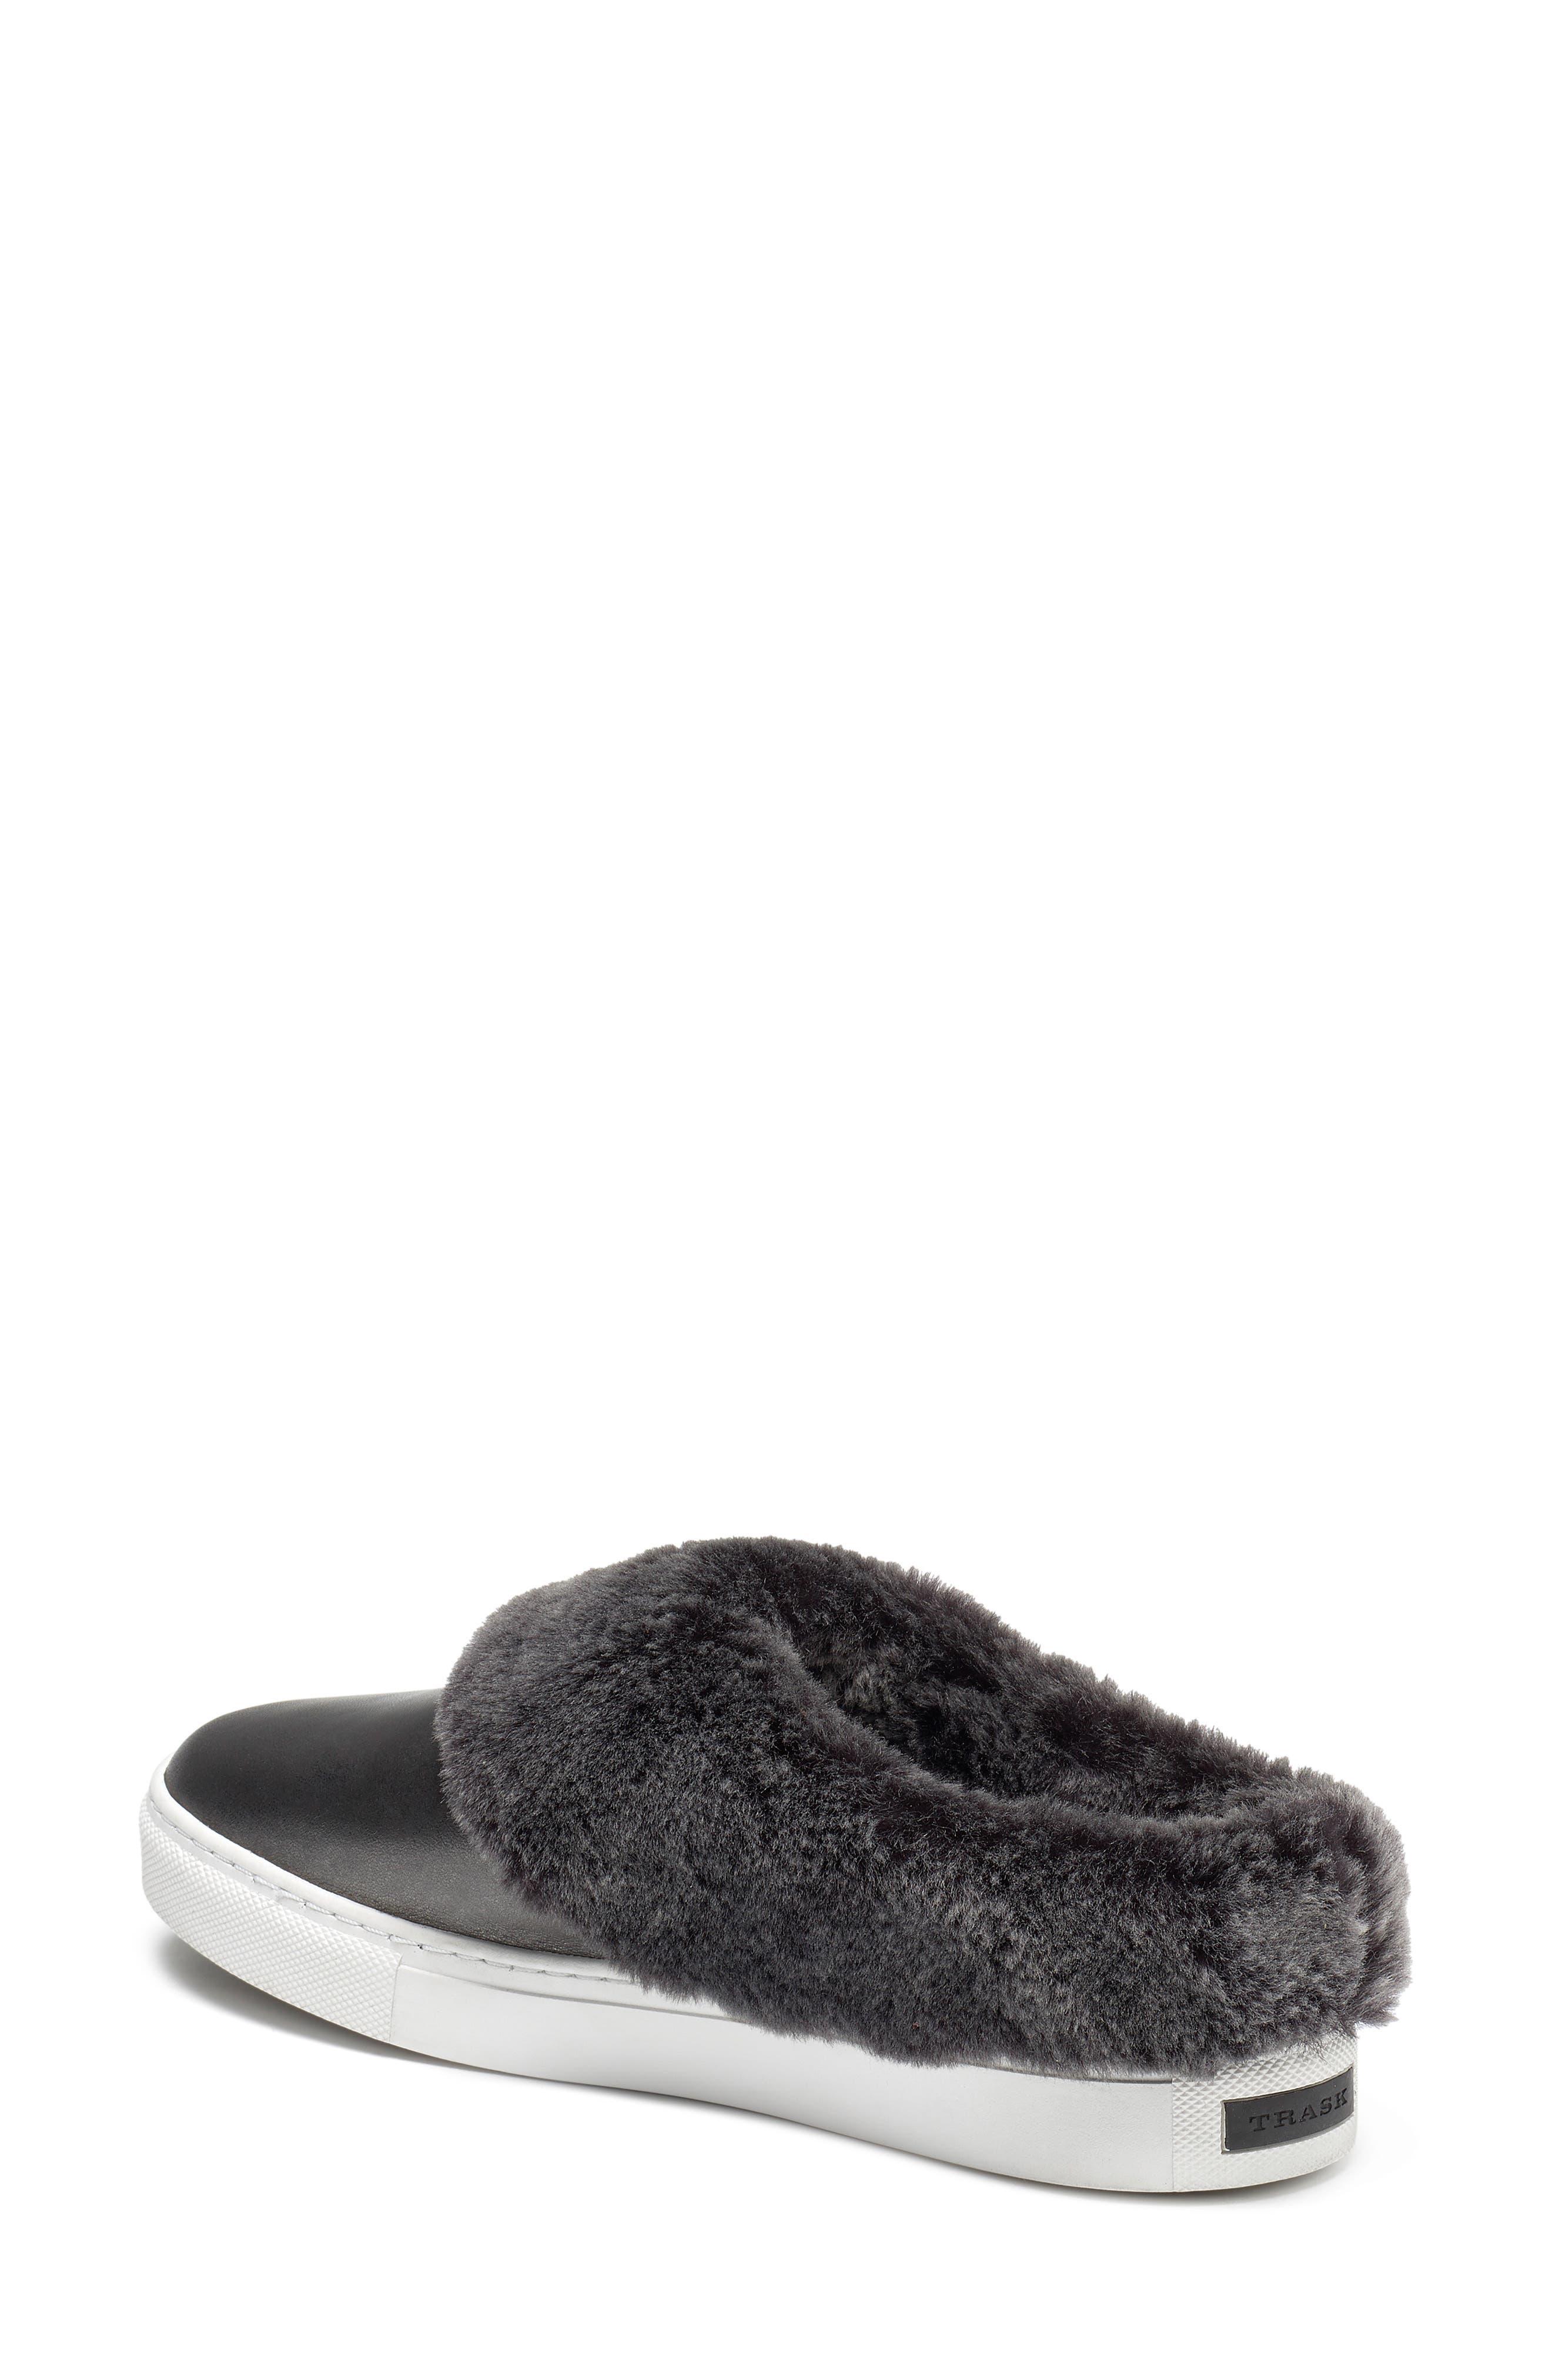 TRASK, Lisa Genuine Shearling Trim Slip-On Sneaker, Alternate thumbnail 2, color, PEWTER LEATHER